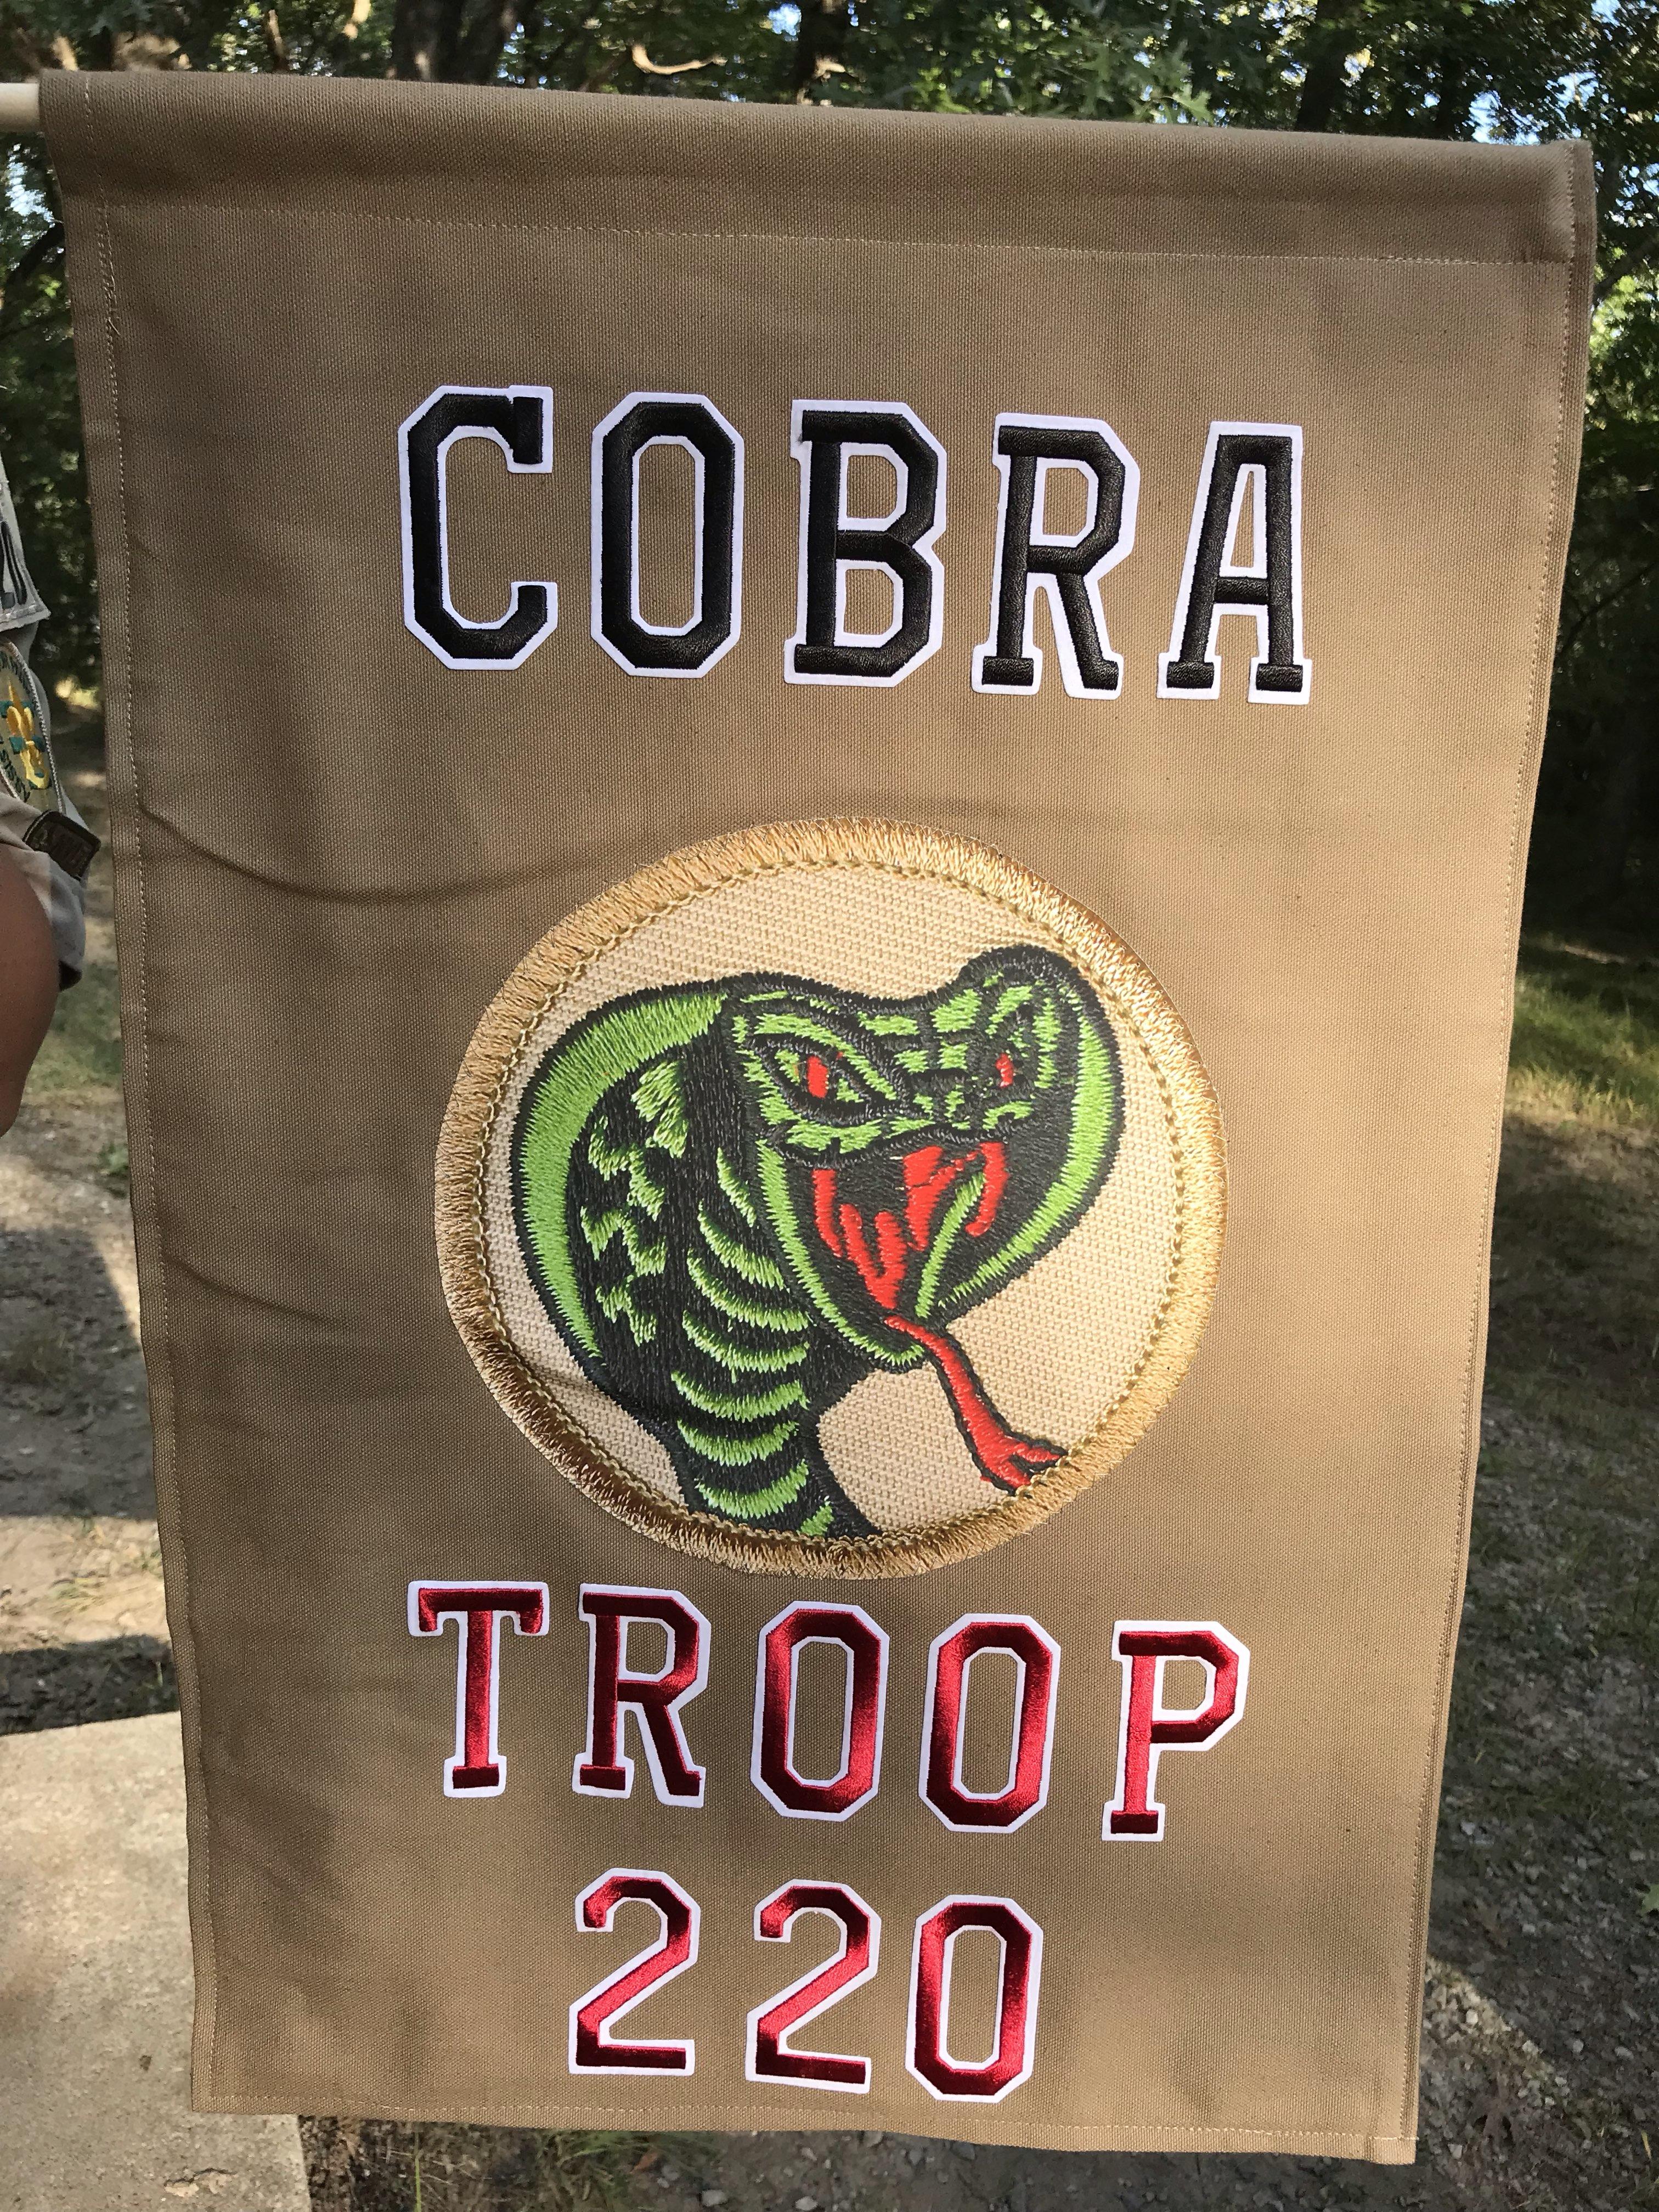 Patrol Flags - Scouts BSA 220 - Boys